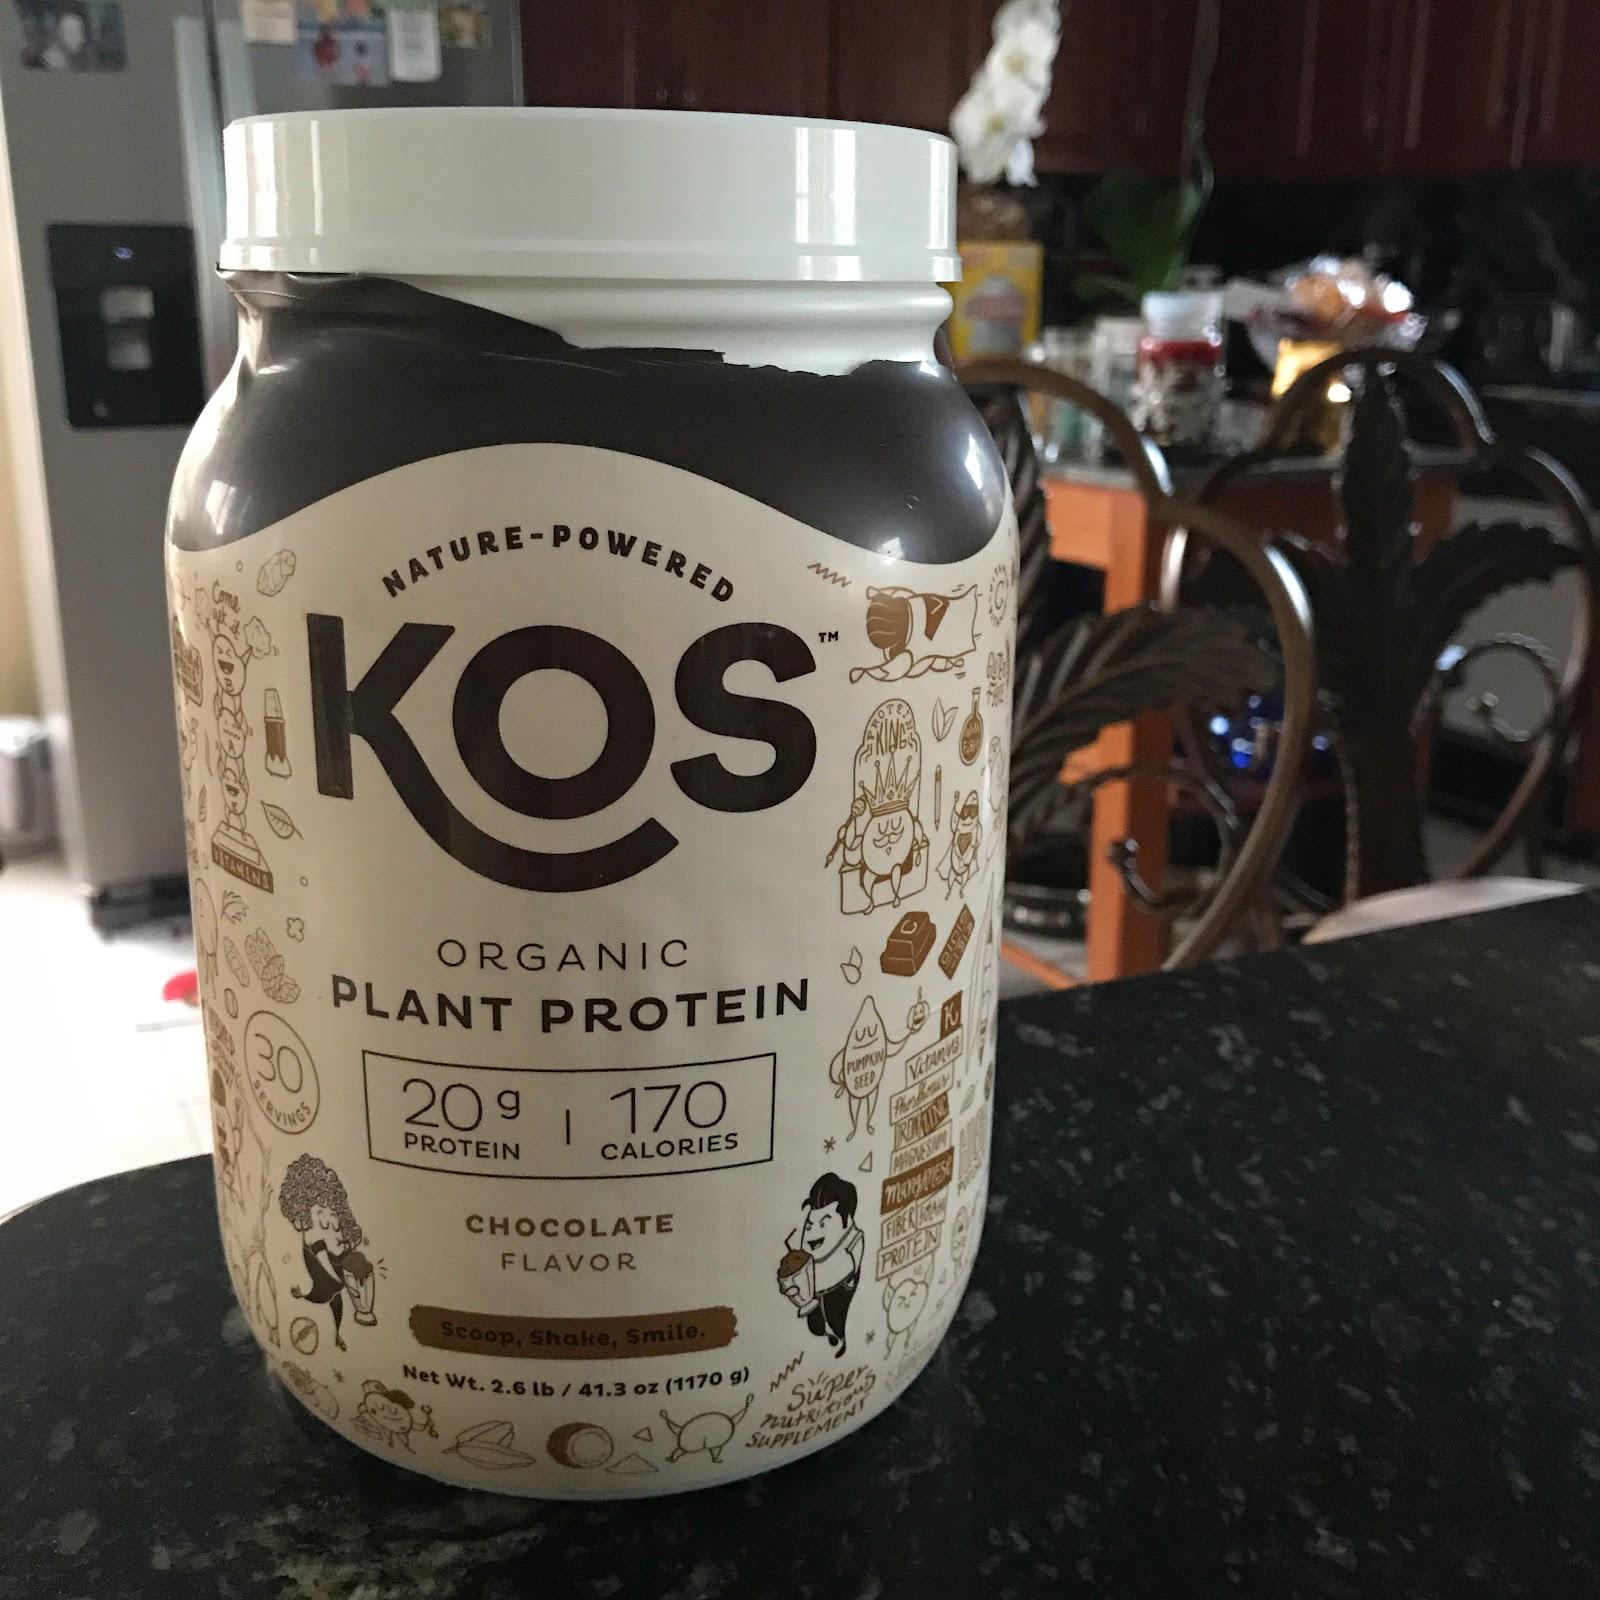 KOS Organic Plant Protein tub.